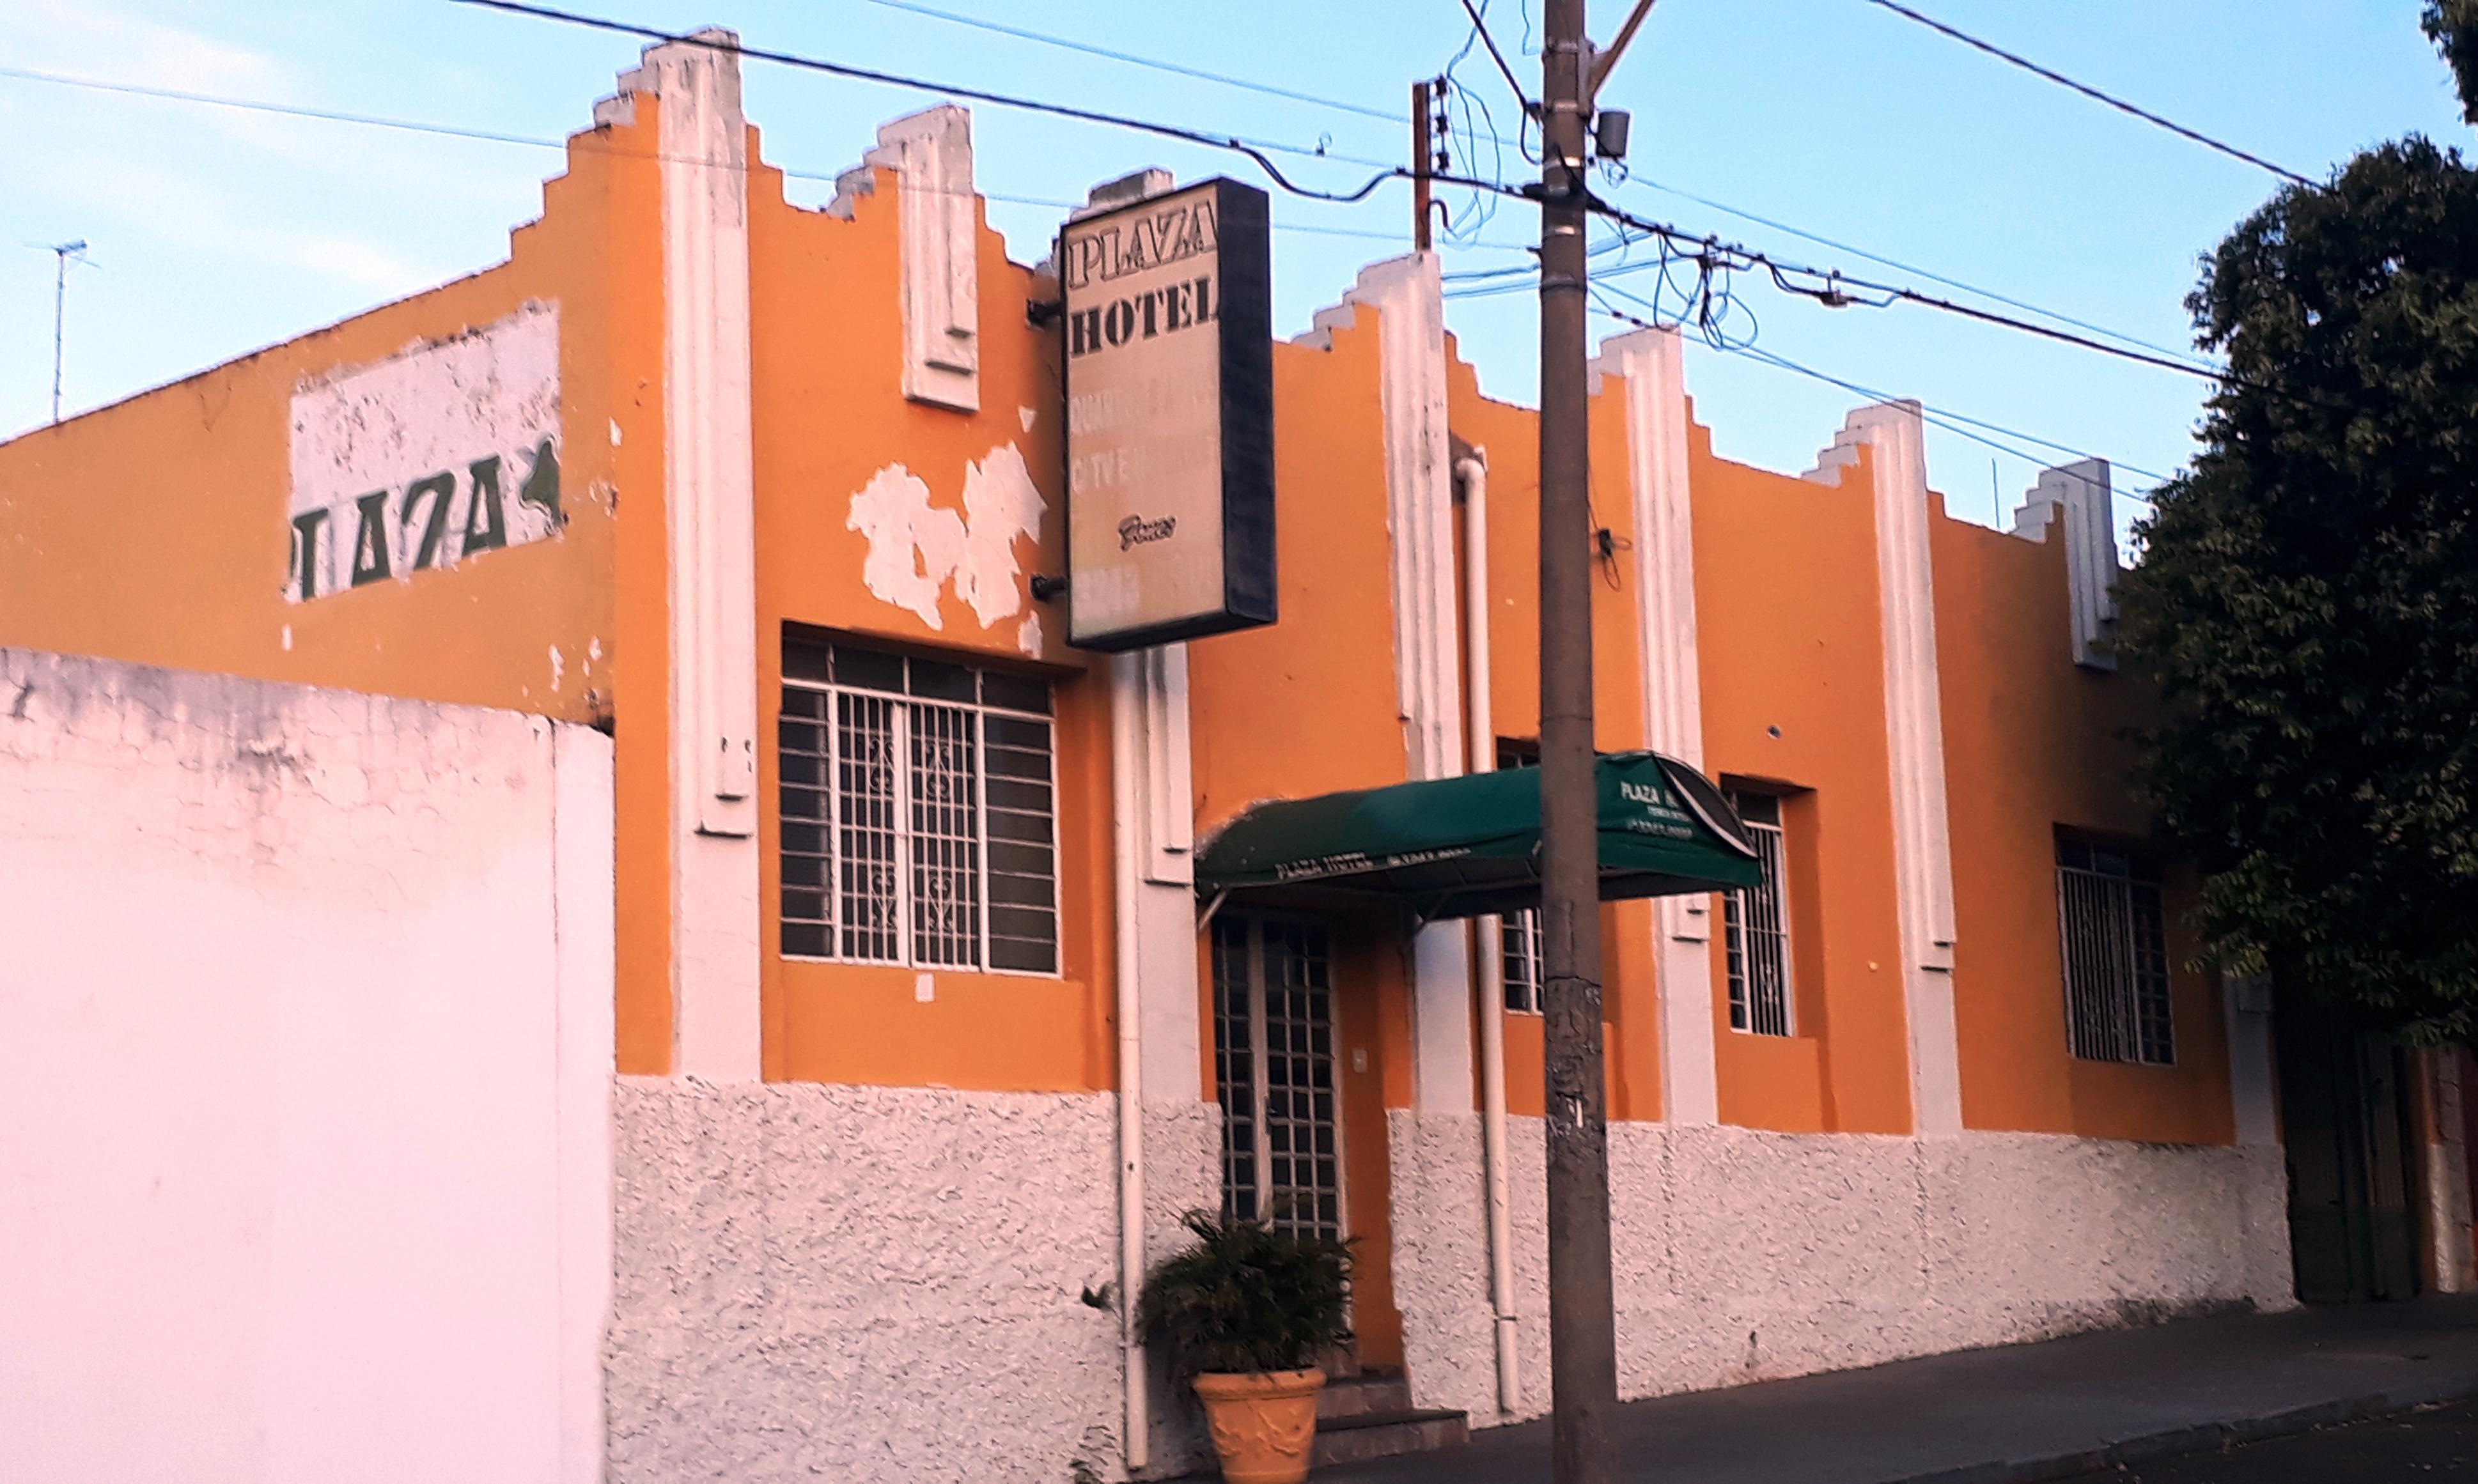 HOTEL PLAZA - BAURU